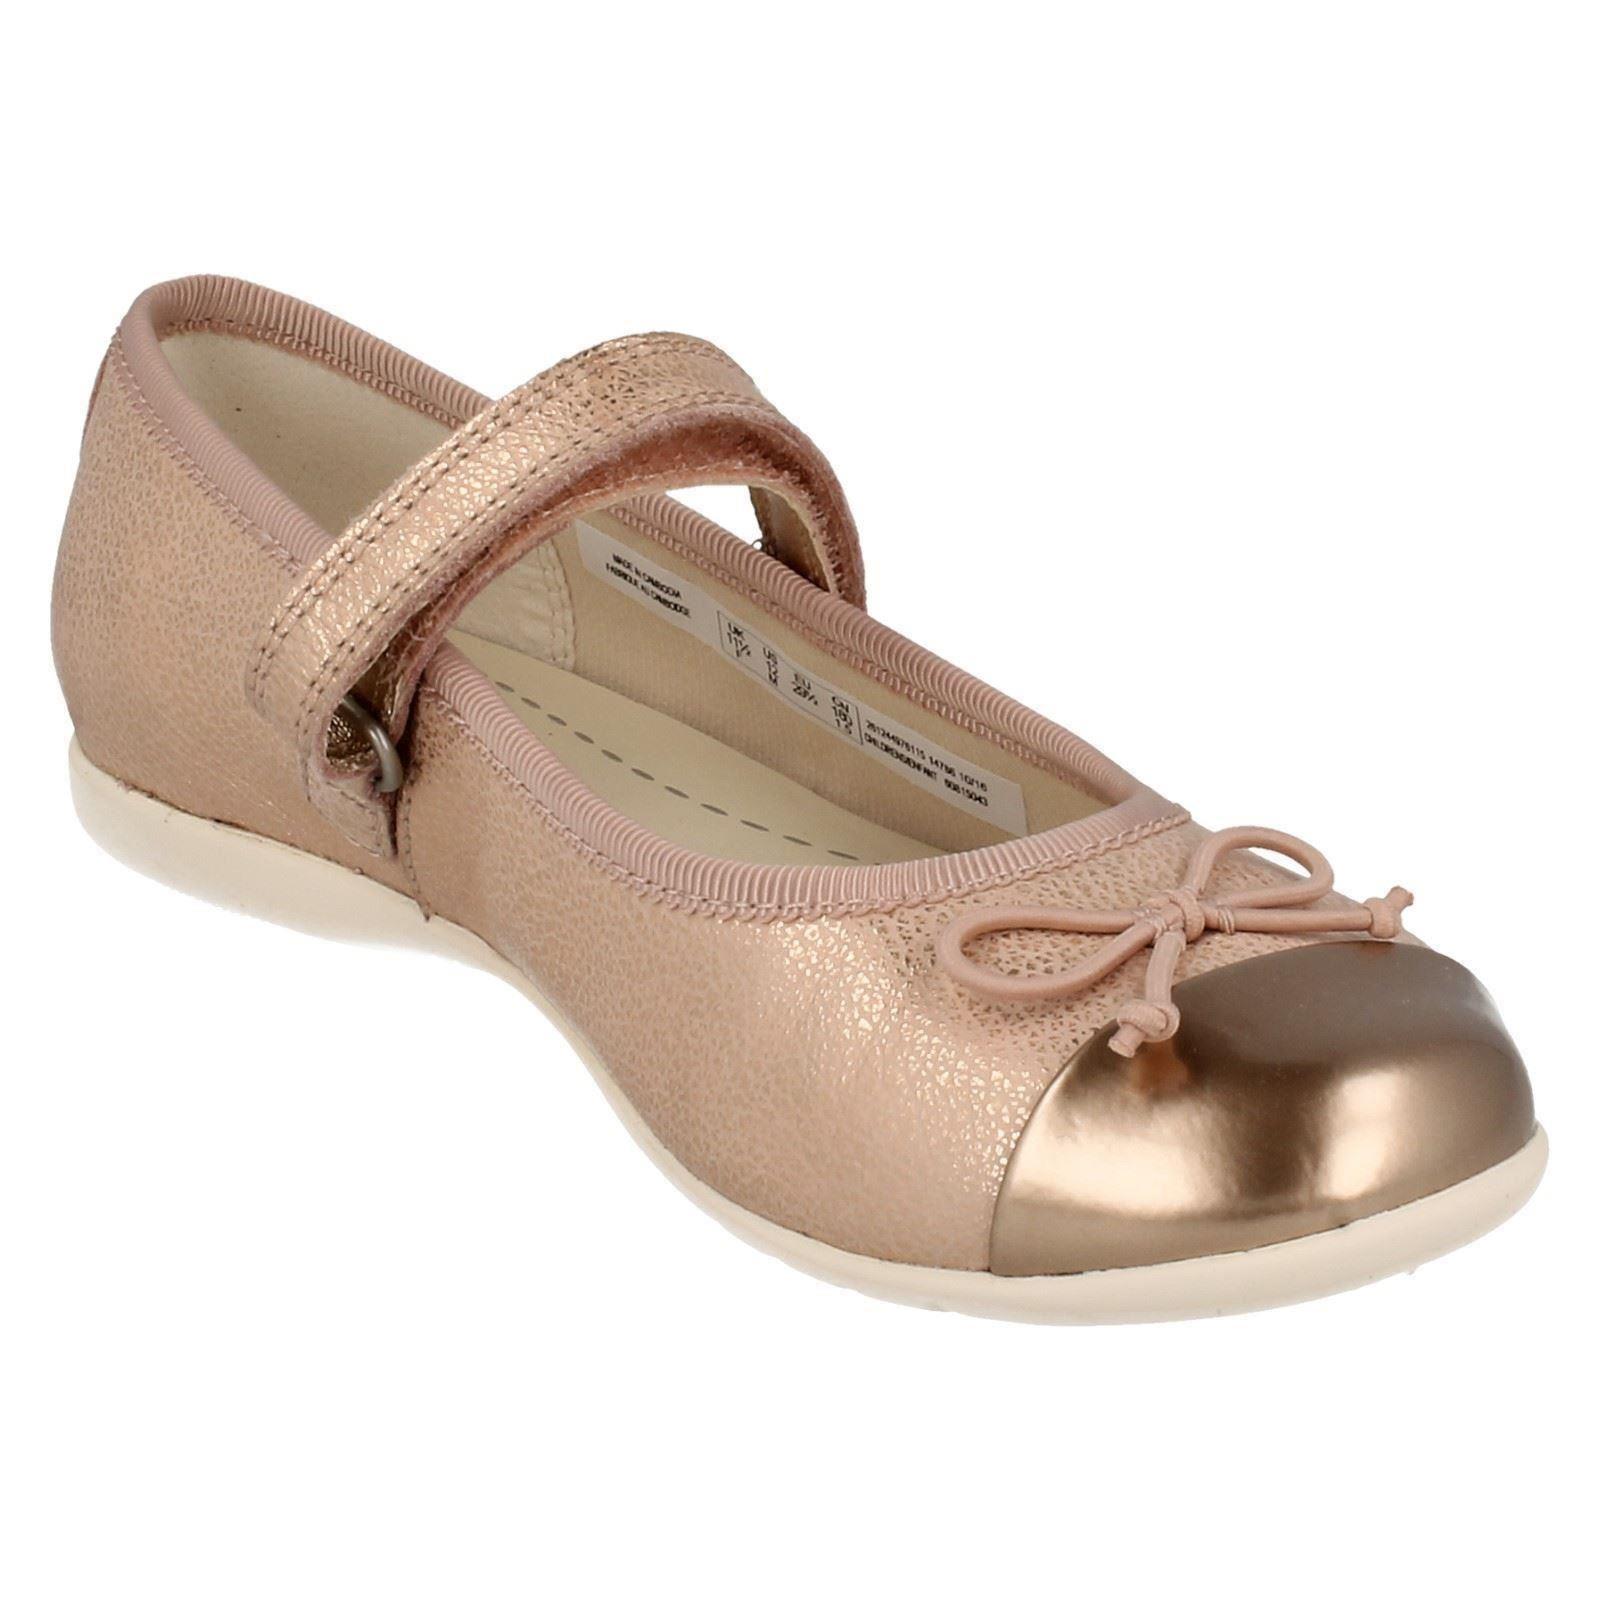 Infantil Chicas Clarks Zapatos Estilo Ballet Danza Mad